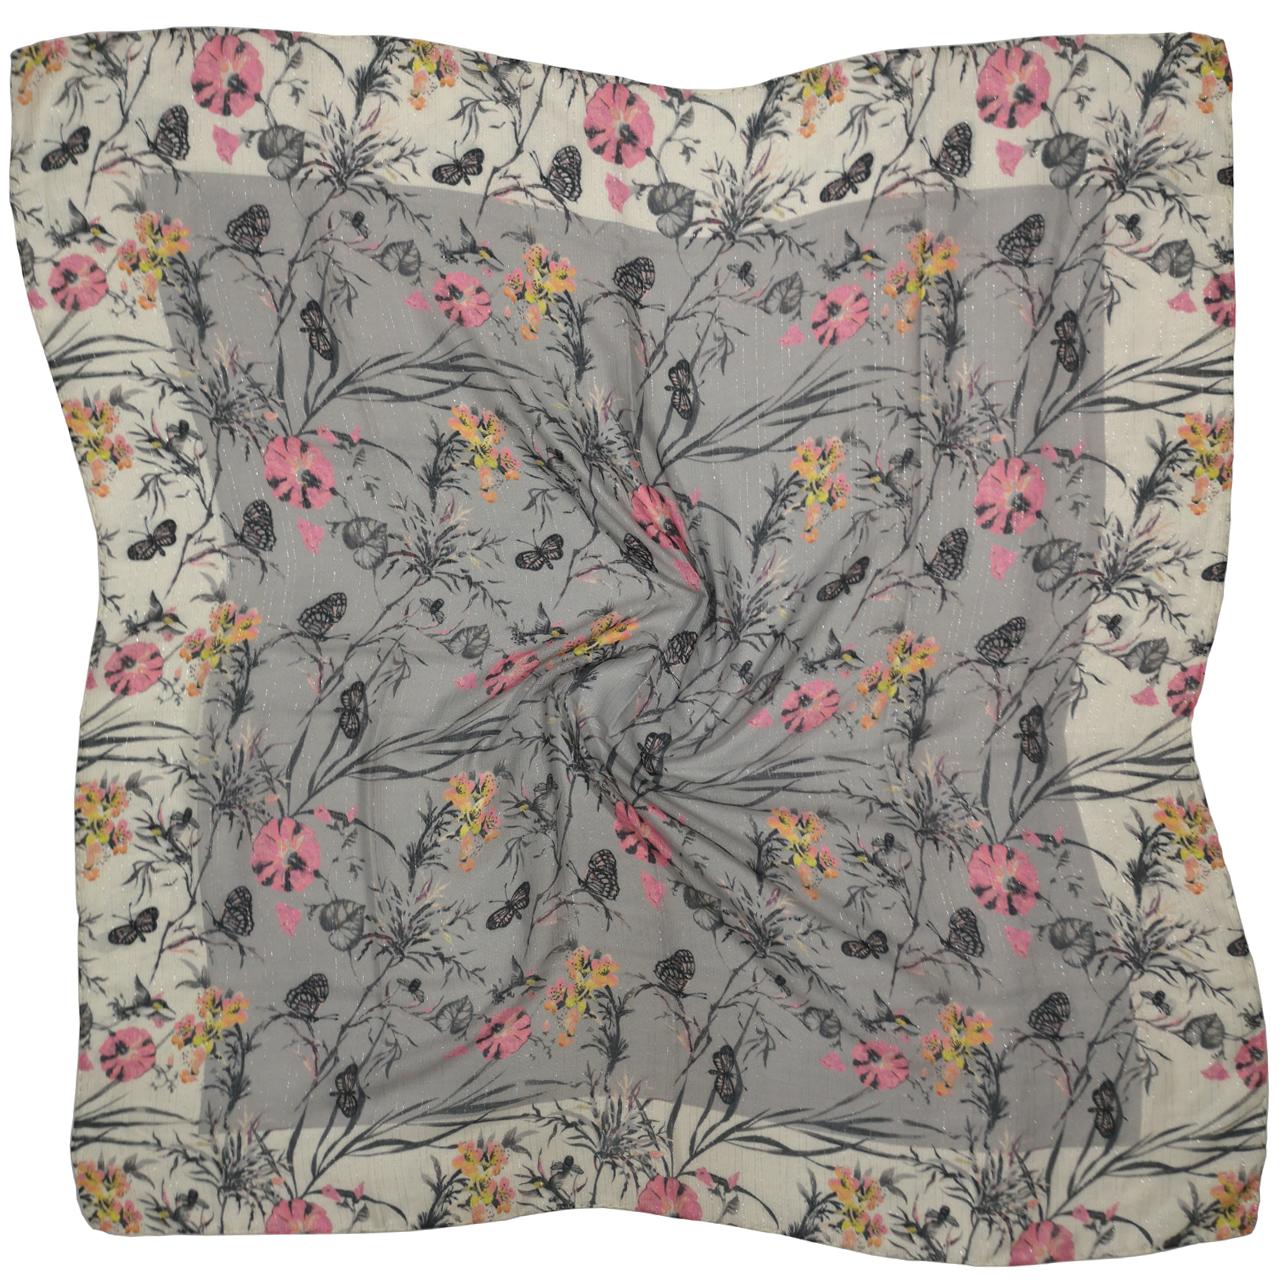 روسری زنانه کد 10308